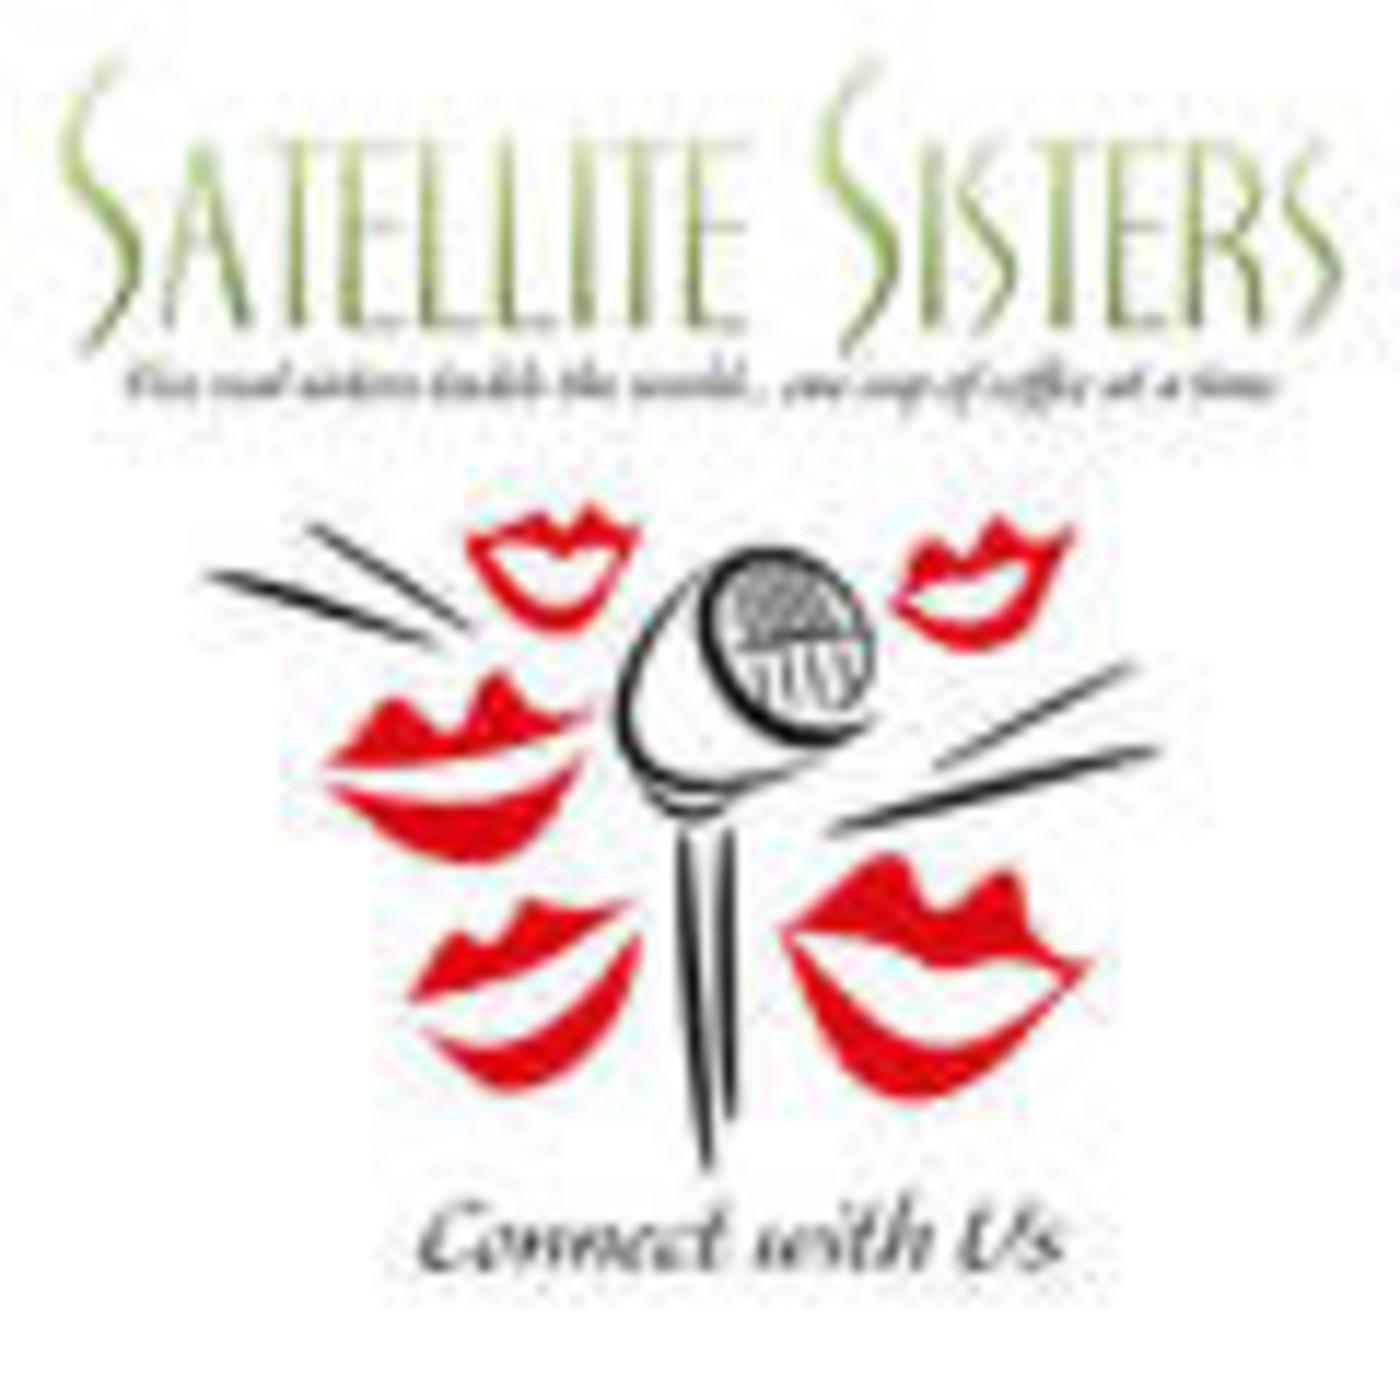 The Satellite Sisters